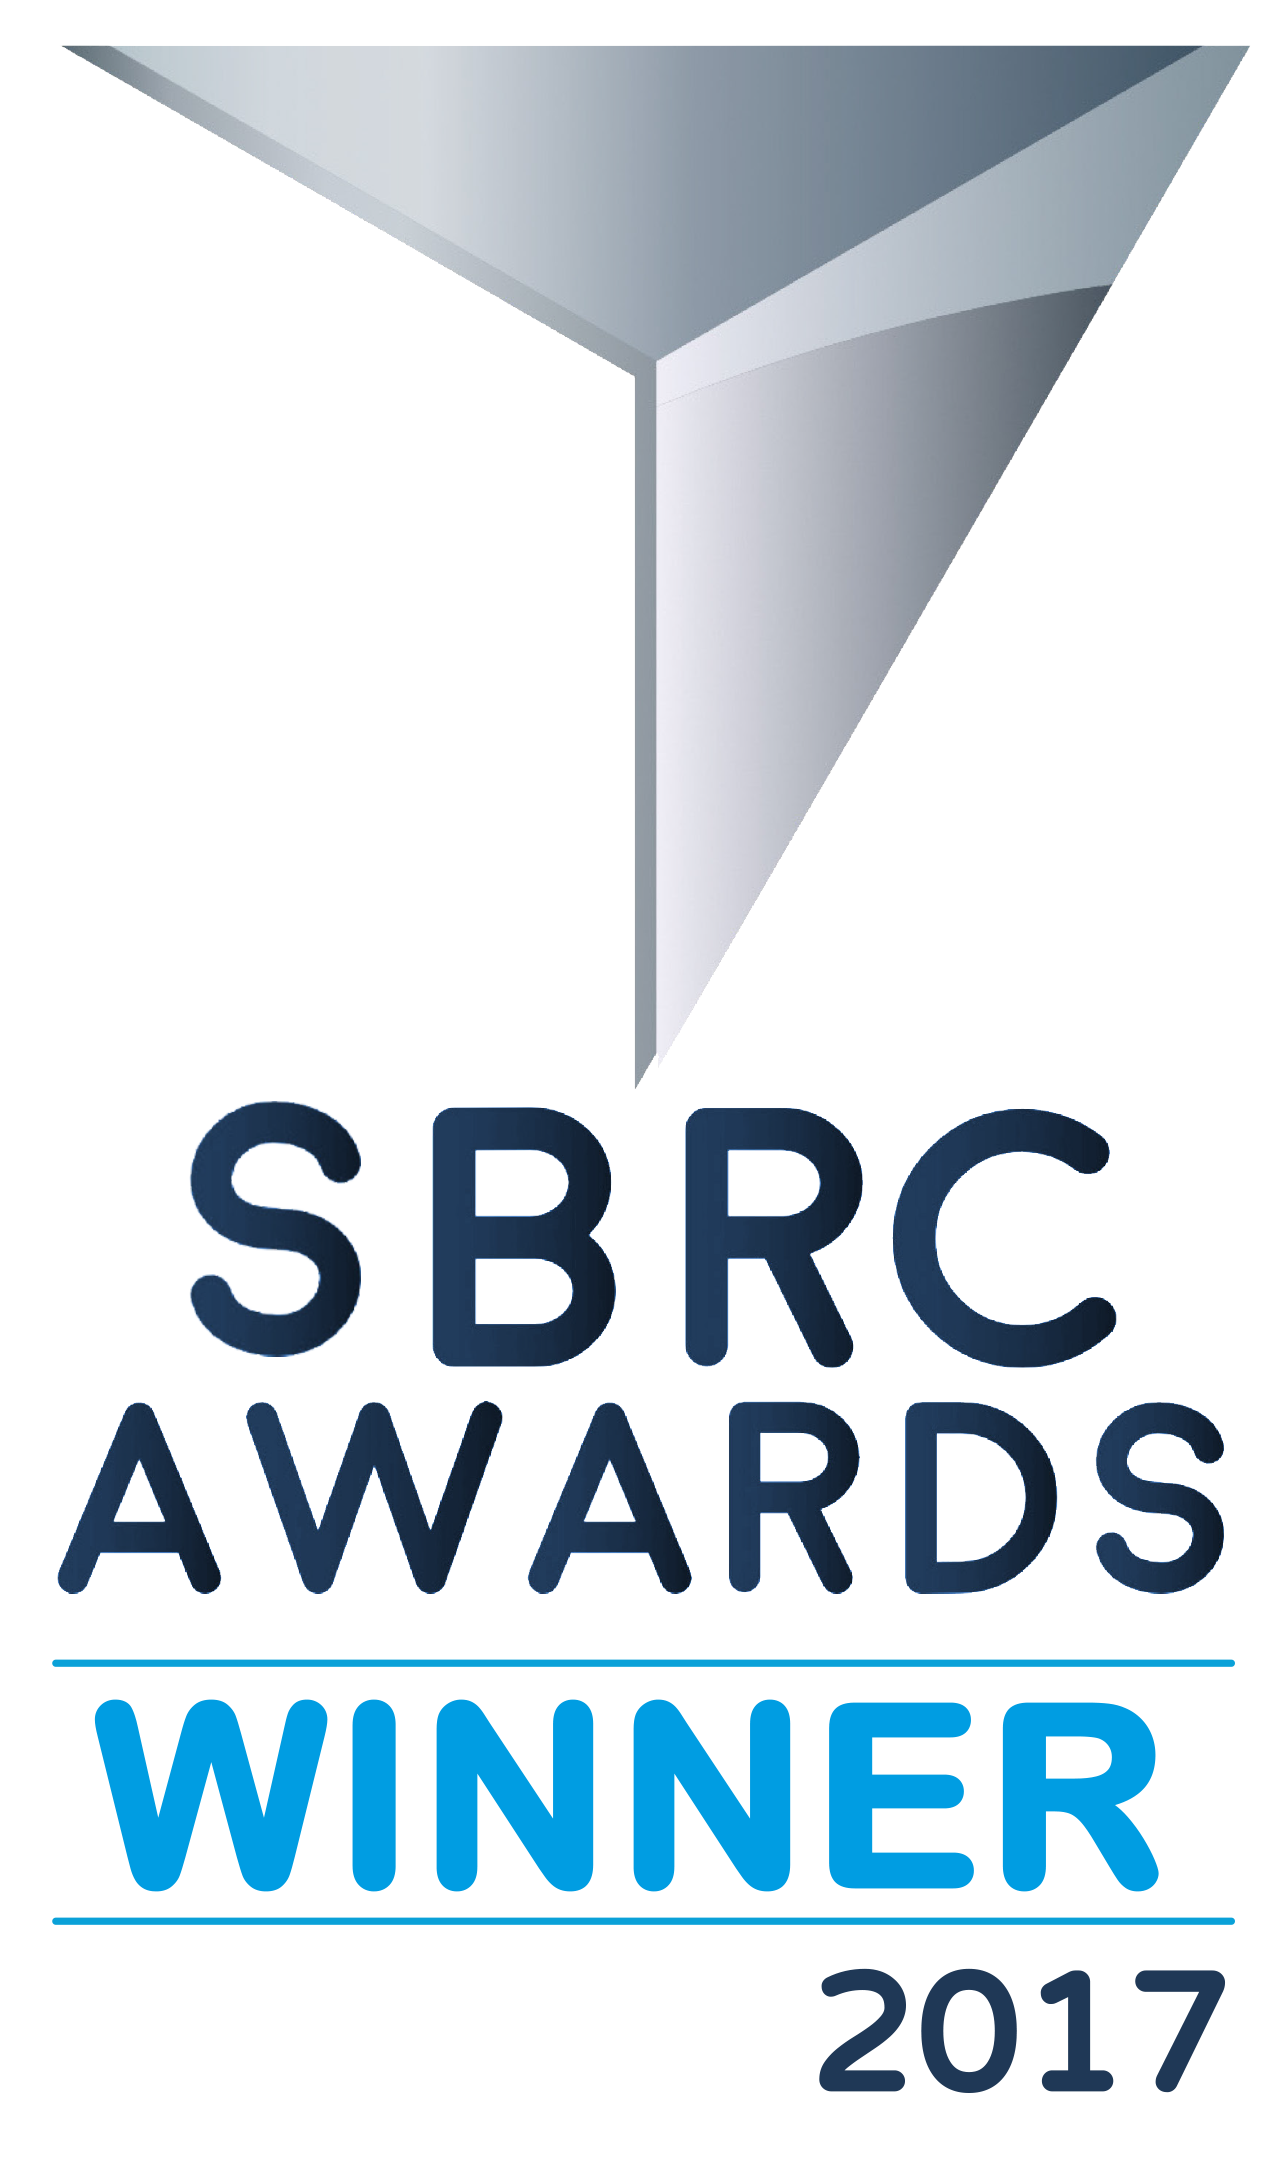 SBRCWinner